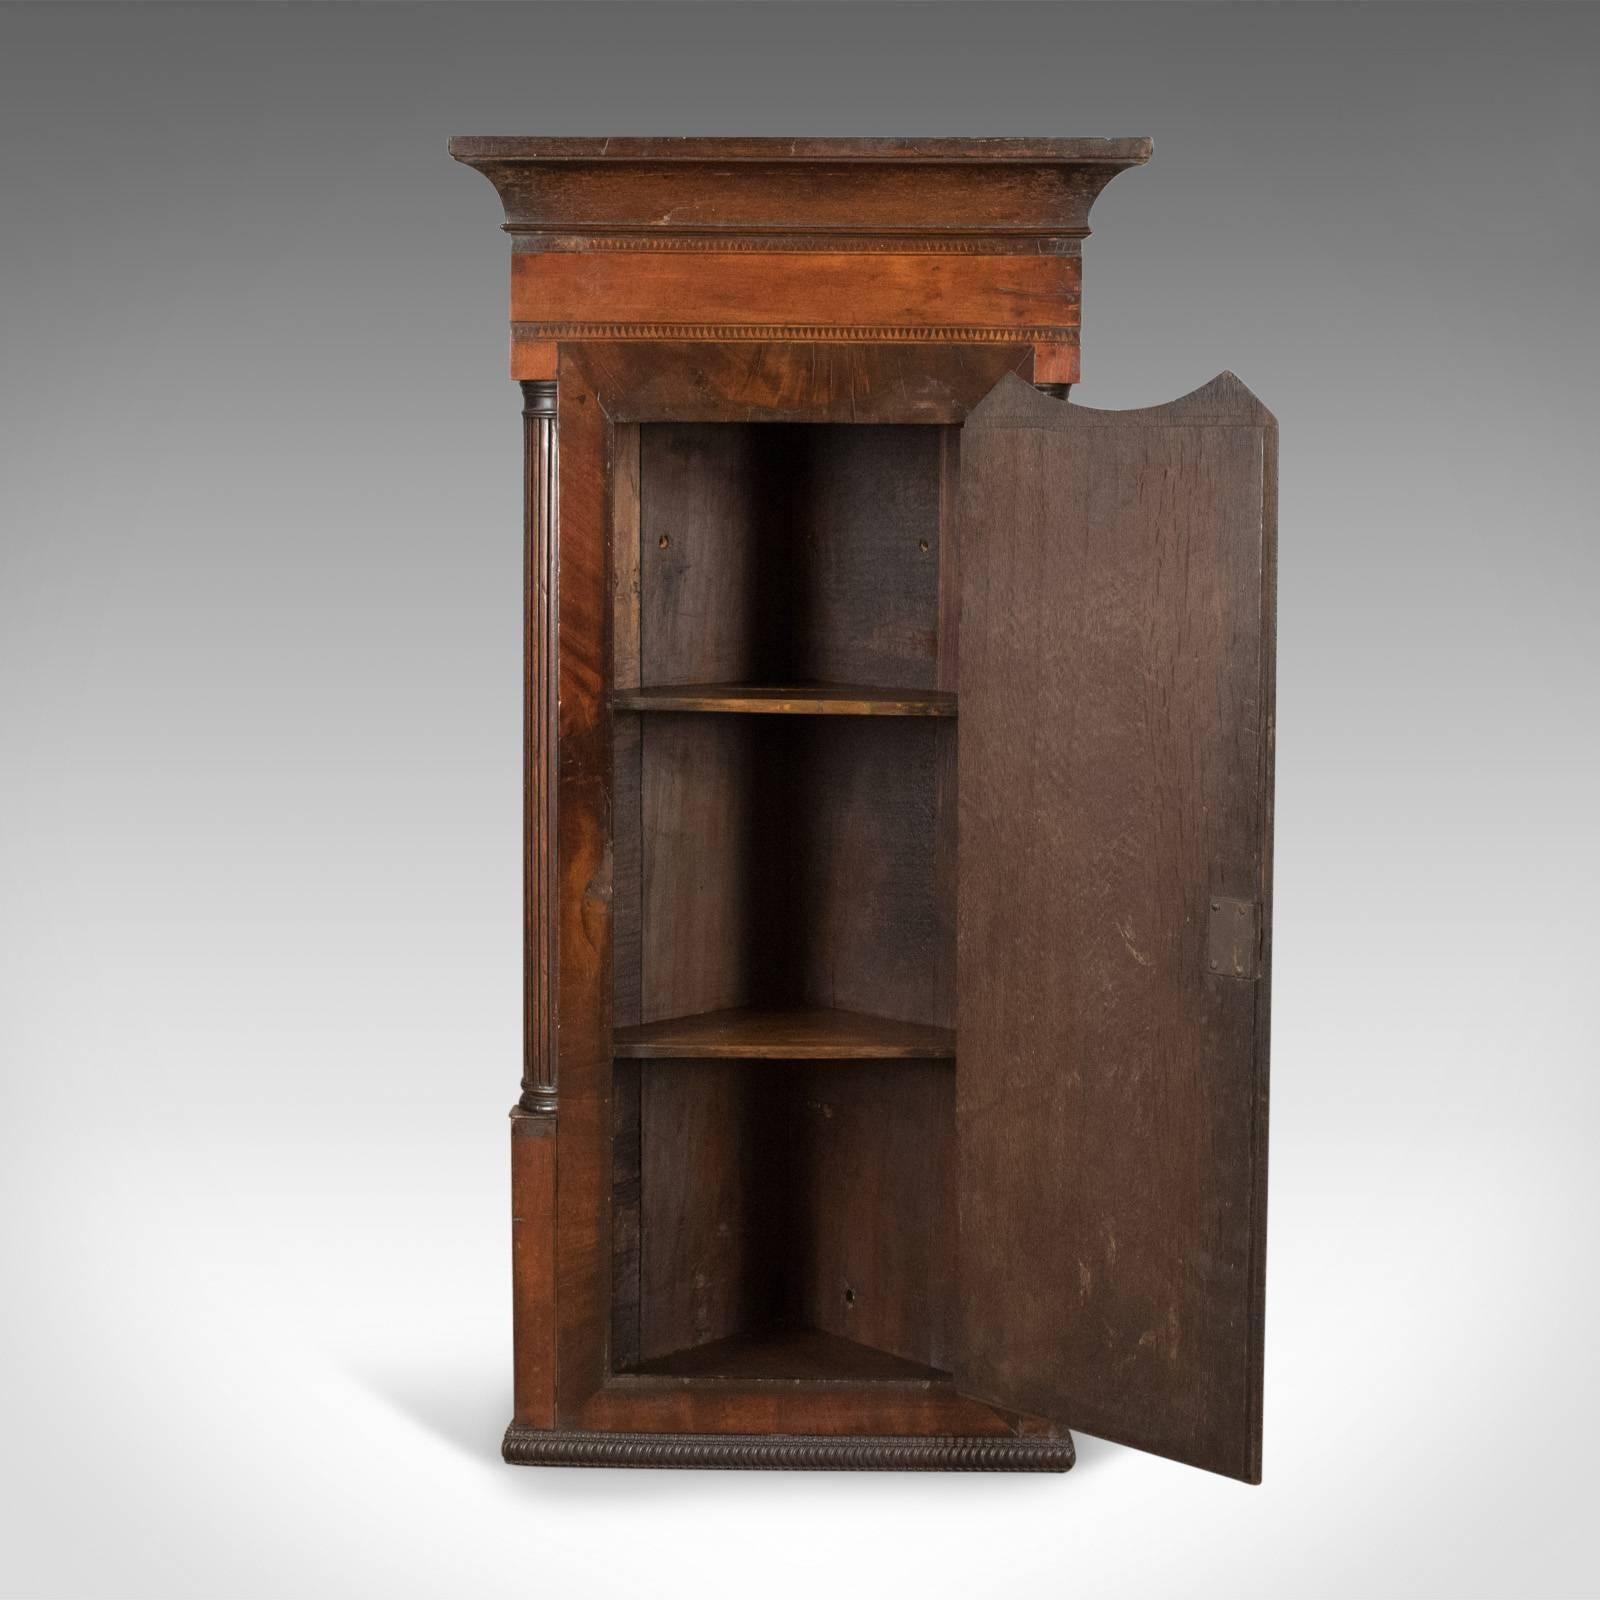 Merveilleux English Antique Corner Cabinet, Georgian, Mahogany, Narrow, Hanging Cupboard  Circa 1780 For